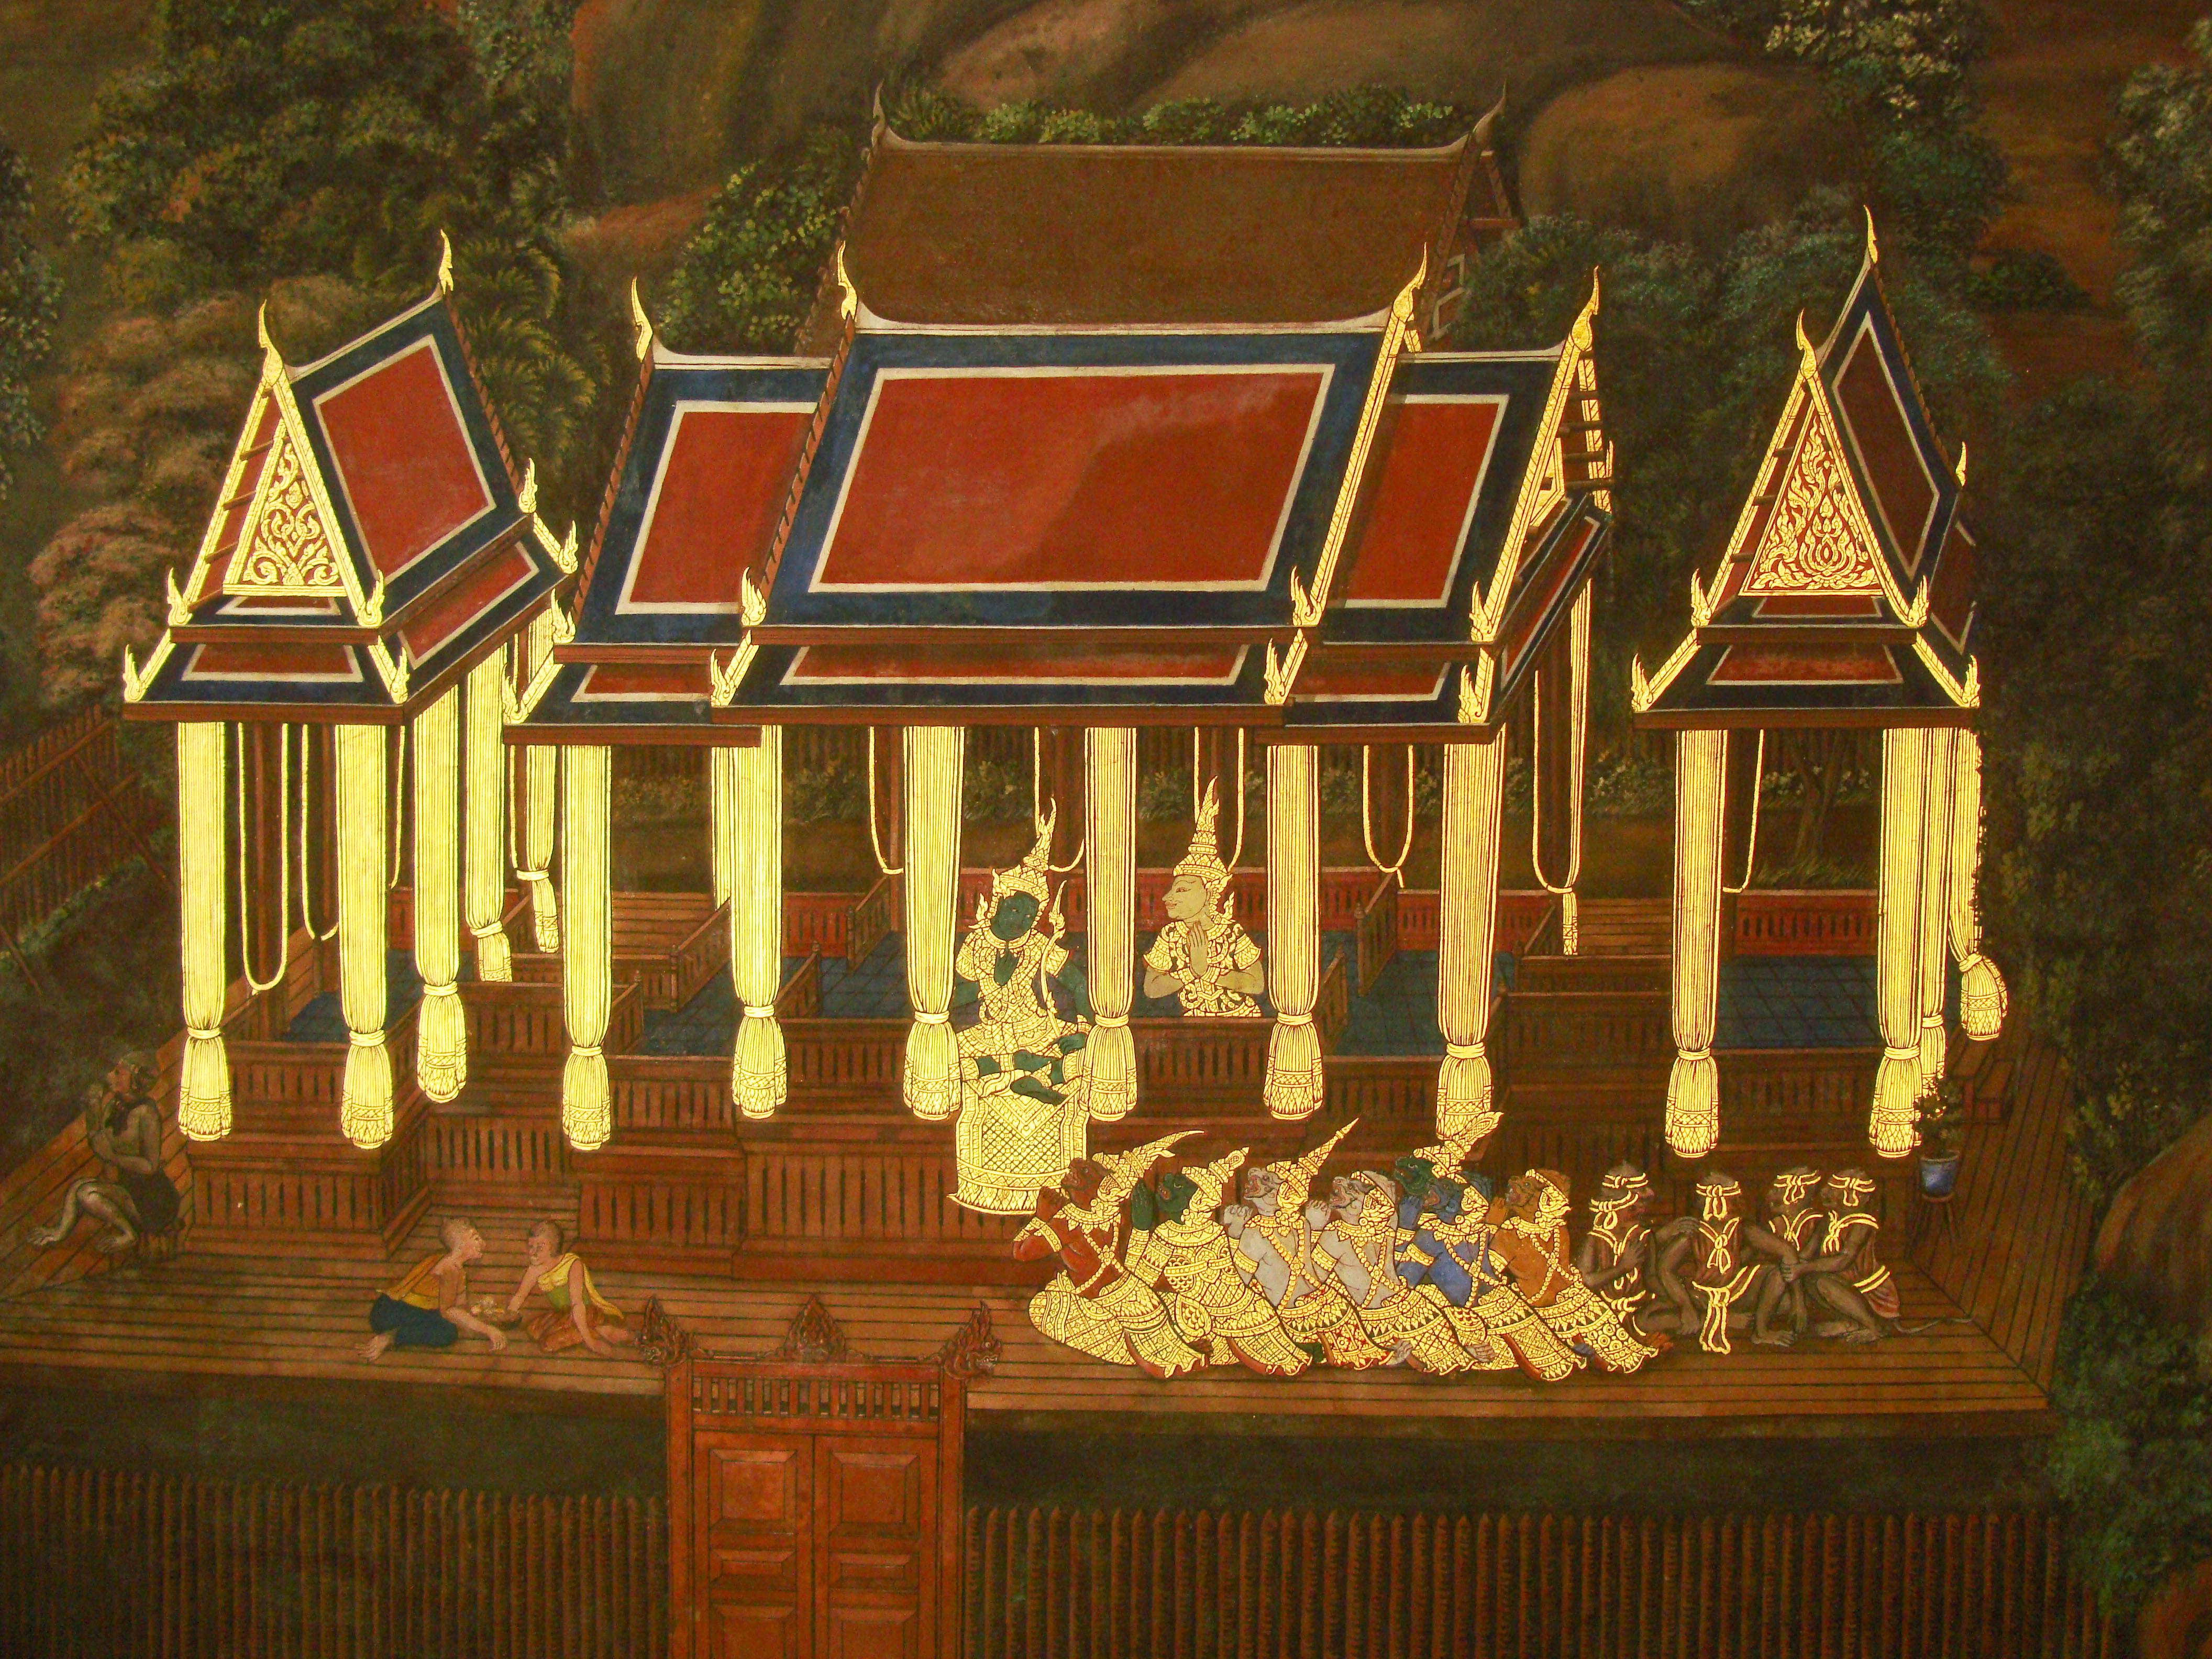 Grand Palace Gold leaf Buddhist artwork Bangkok Thailand 19